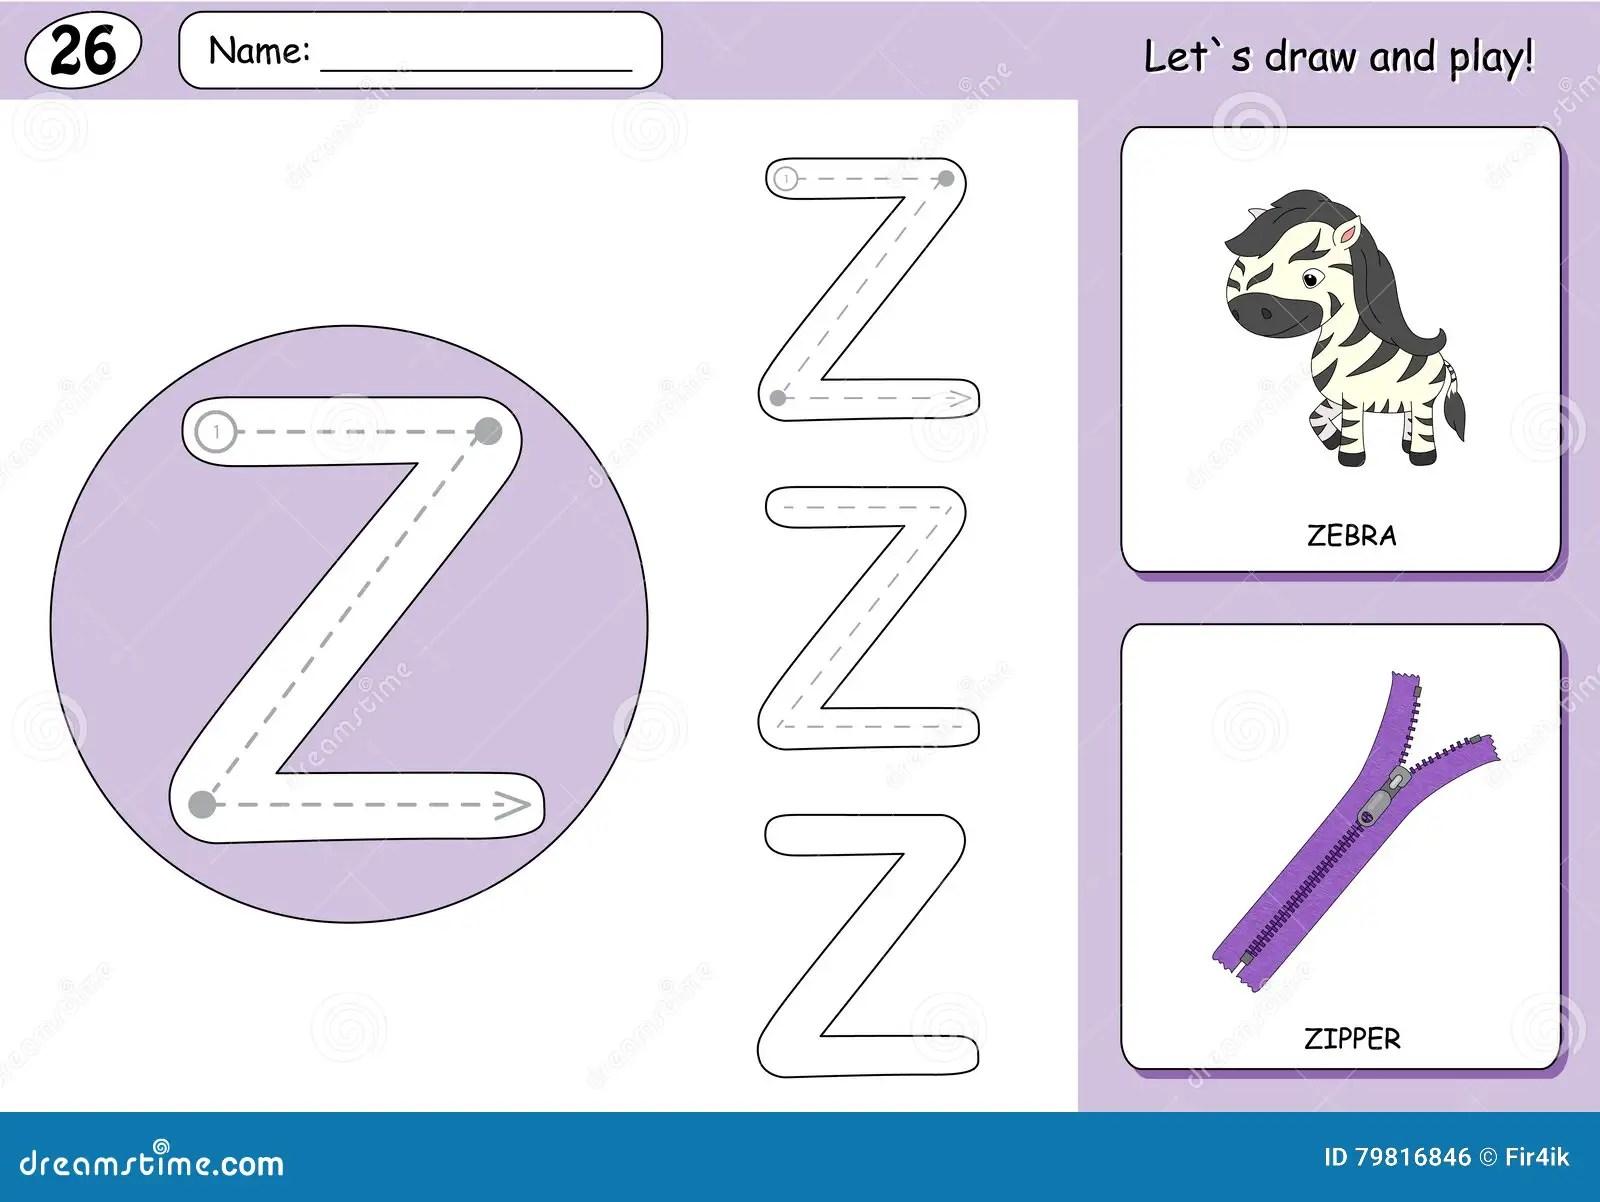 Cartoon Zebra And Zipper Alphabet Tracing Worksheet Stock